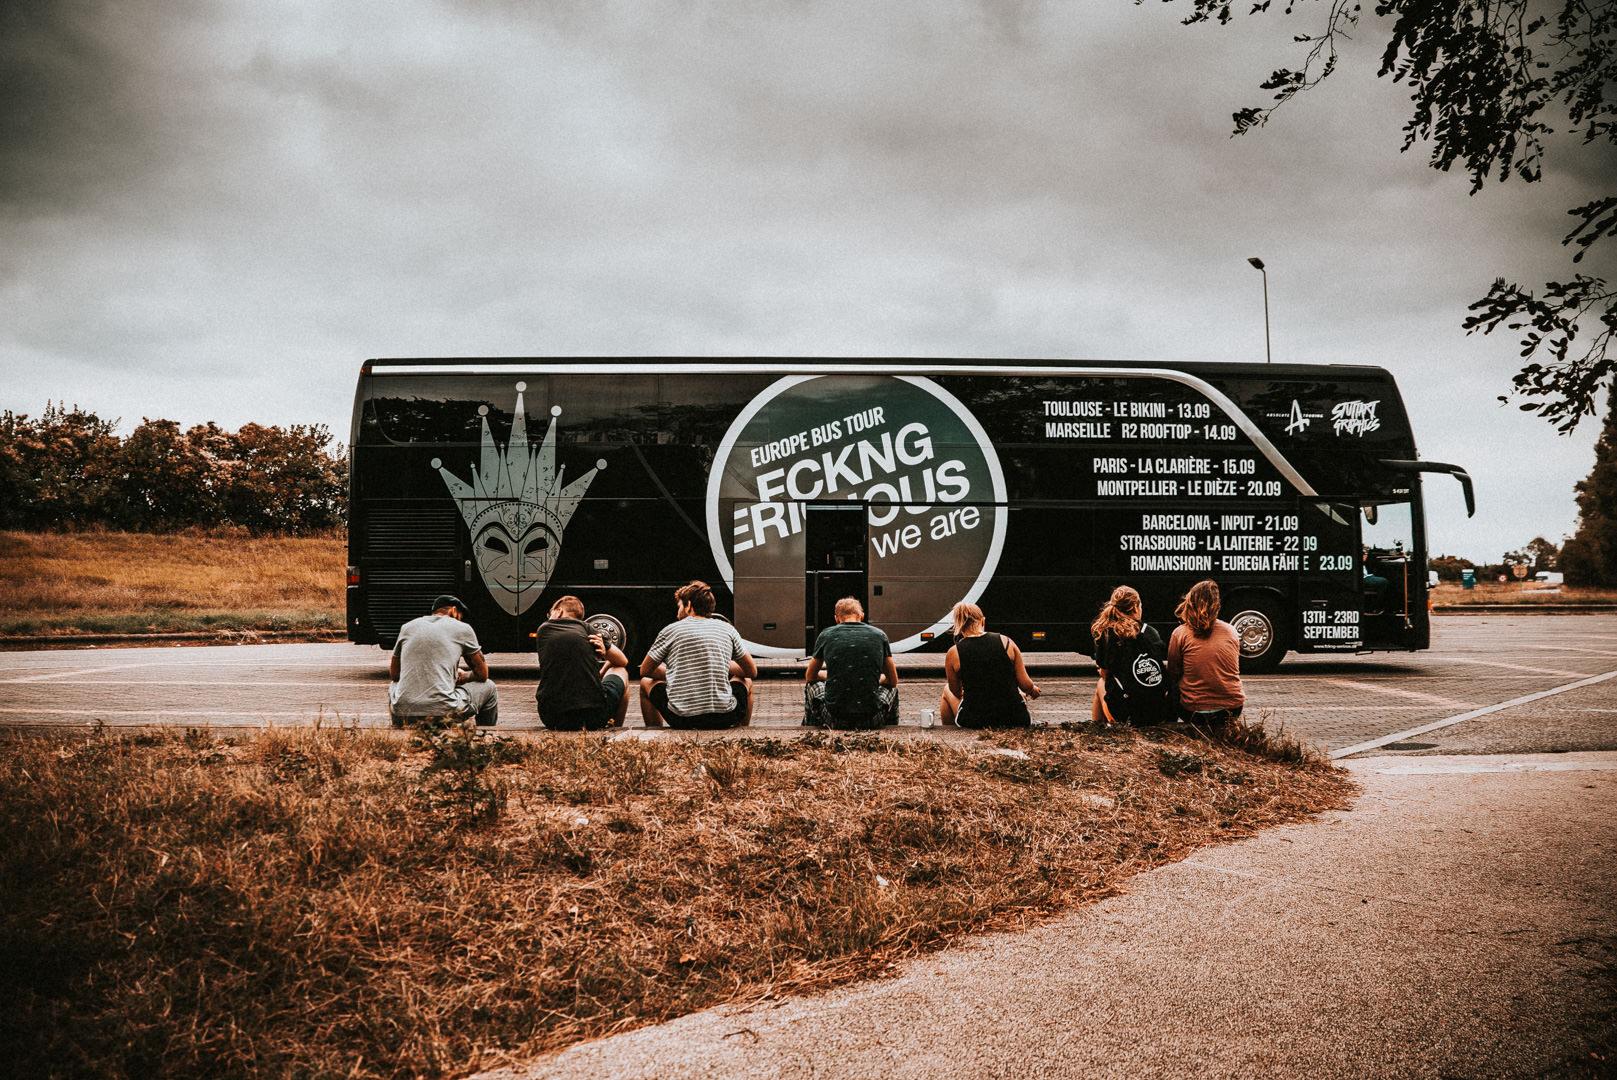 Le Bikini - 13.09.2018 Toulouse (France)FCKNG SERIOUS EUROPE BUS TOUR